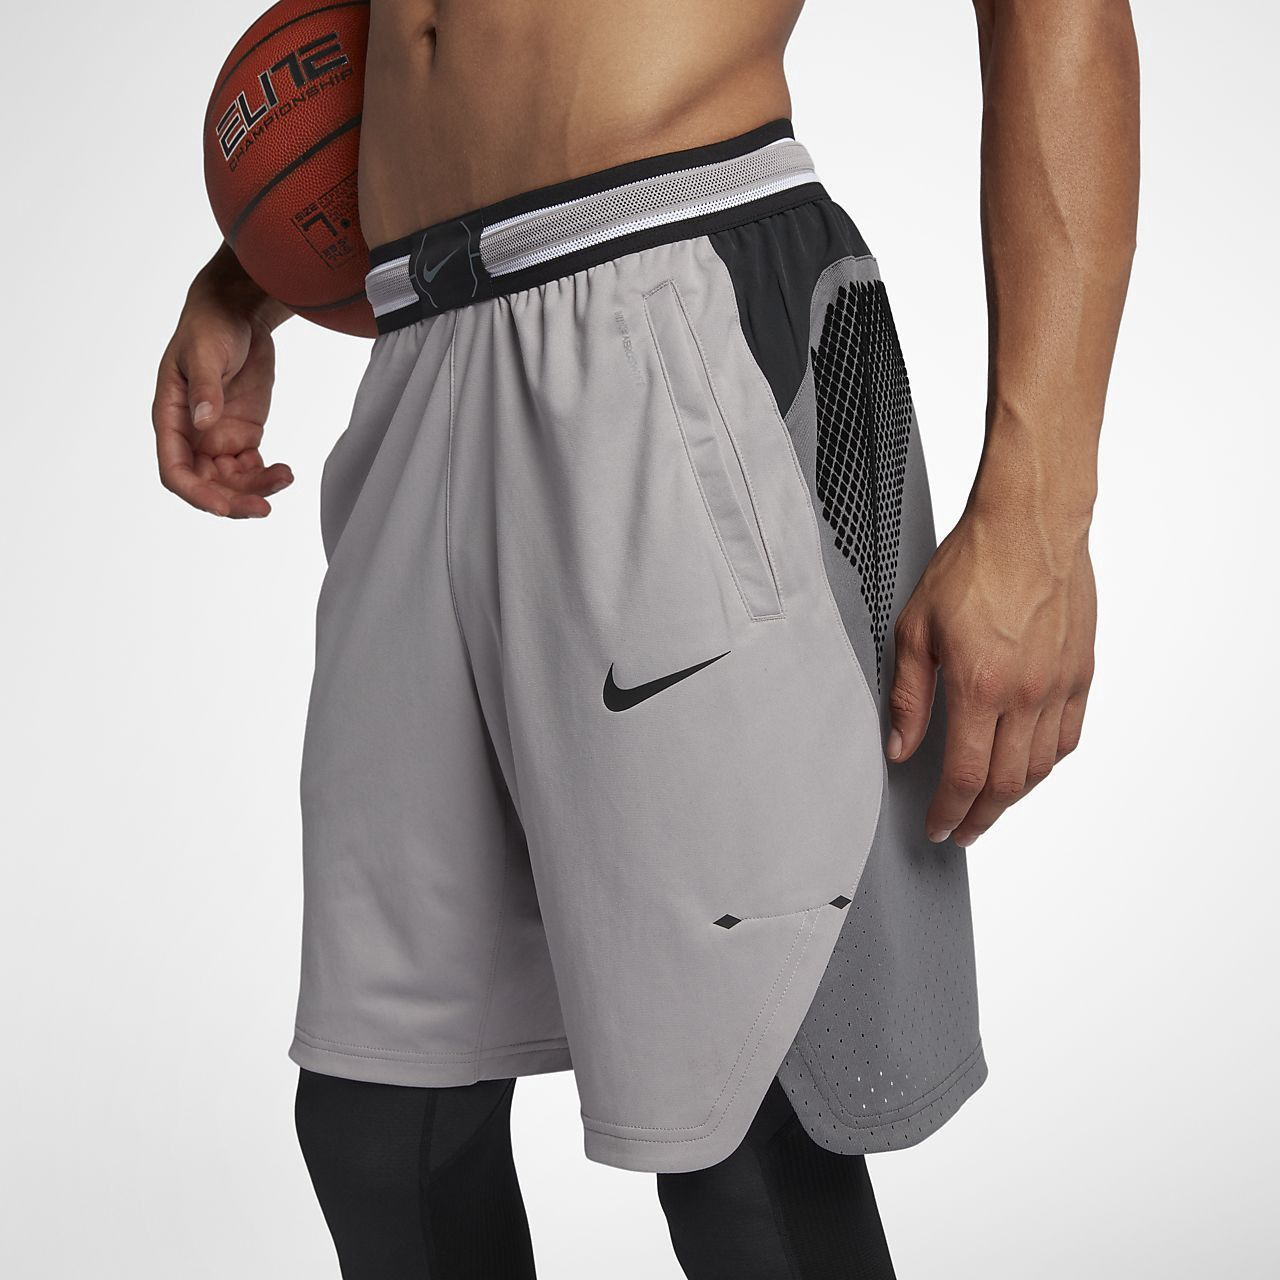 nike shorts 3xl